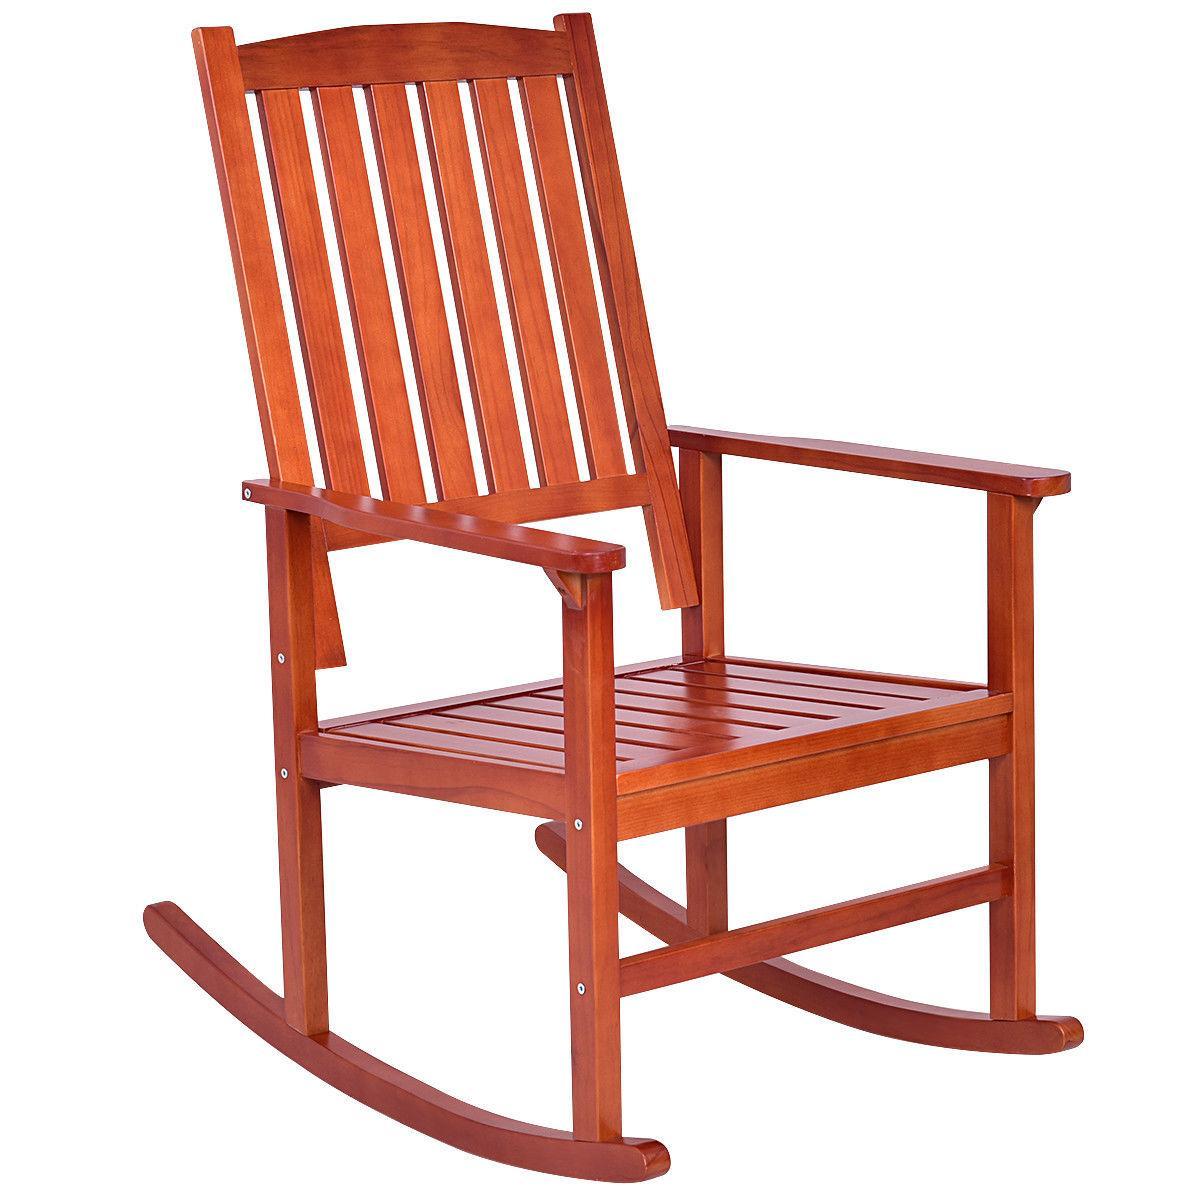 Set of 2 Rocking Chair Porch Indoor Outdoor Furniture